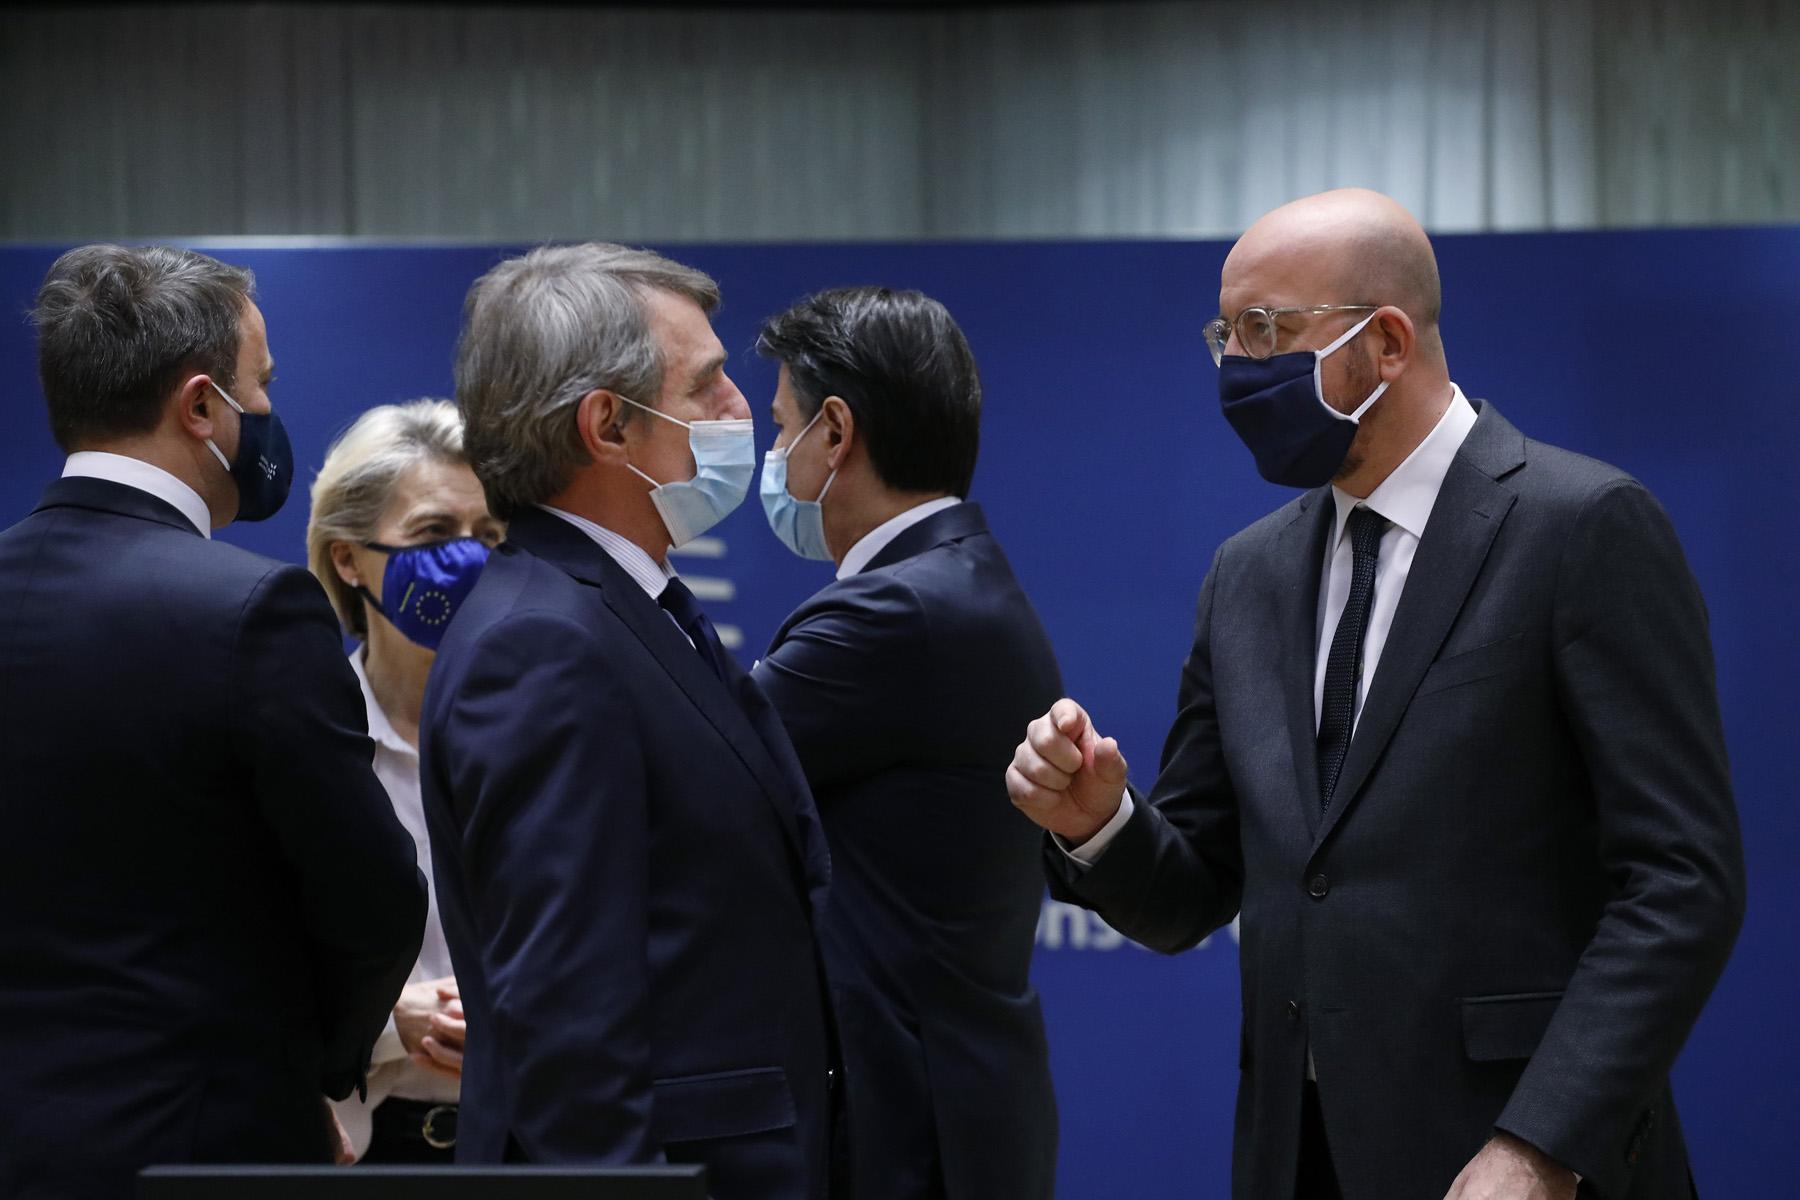 Sassoli: It is time to make agreement on EU budget final | News | European Parliament